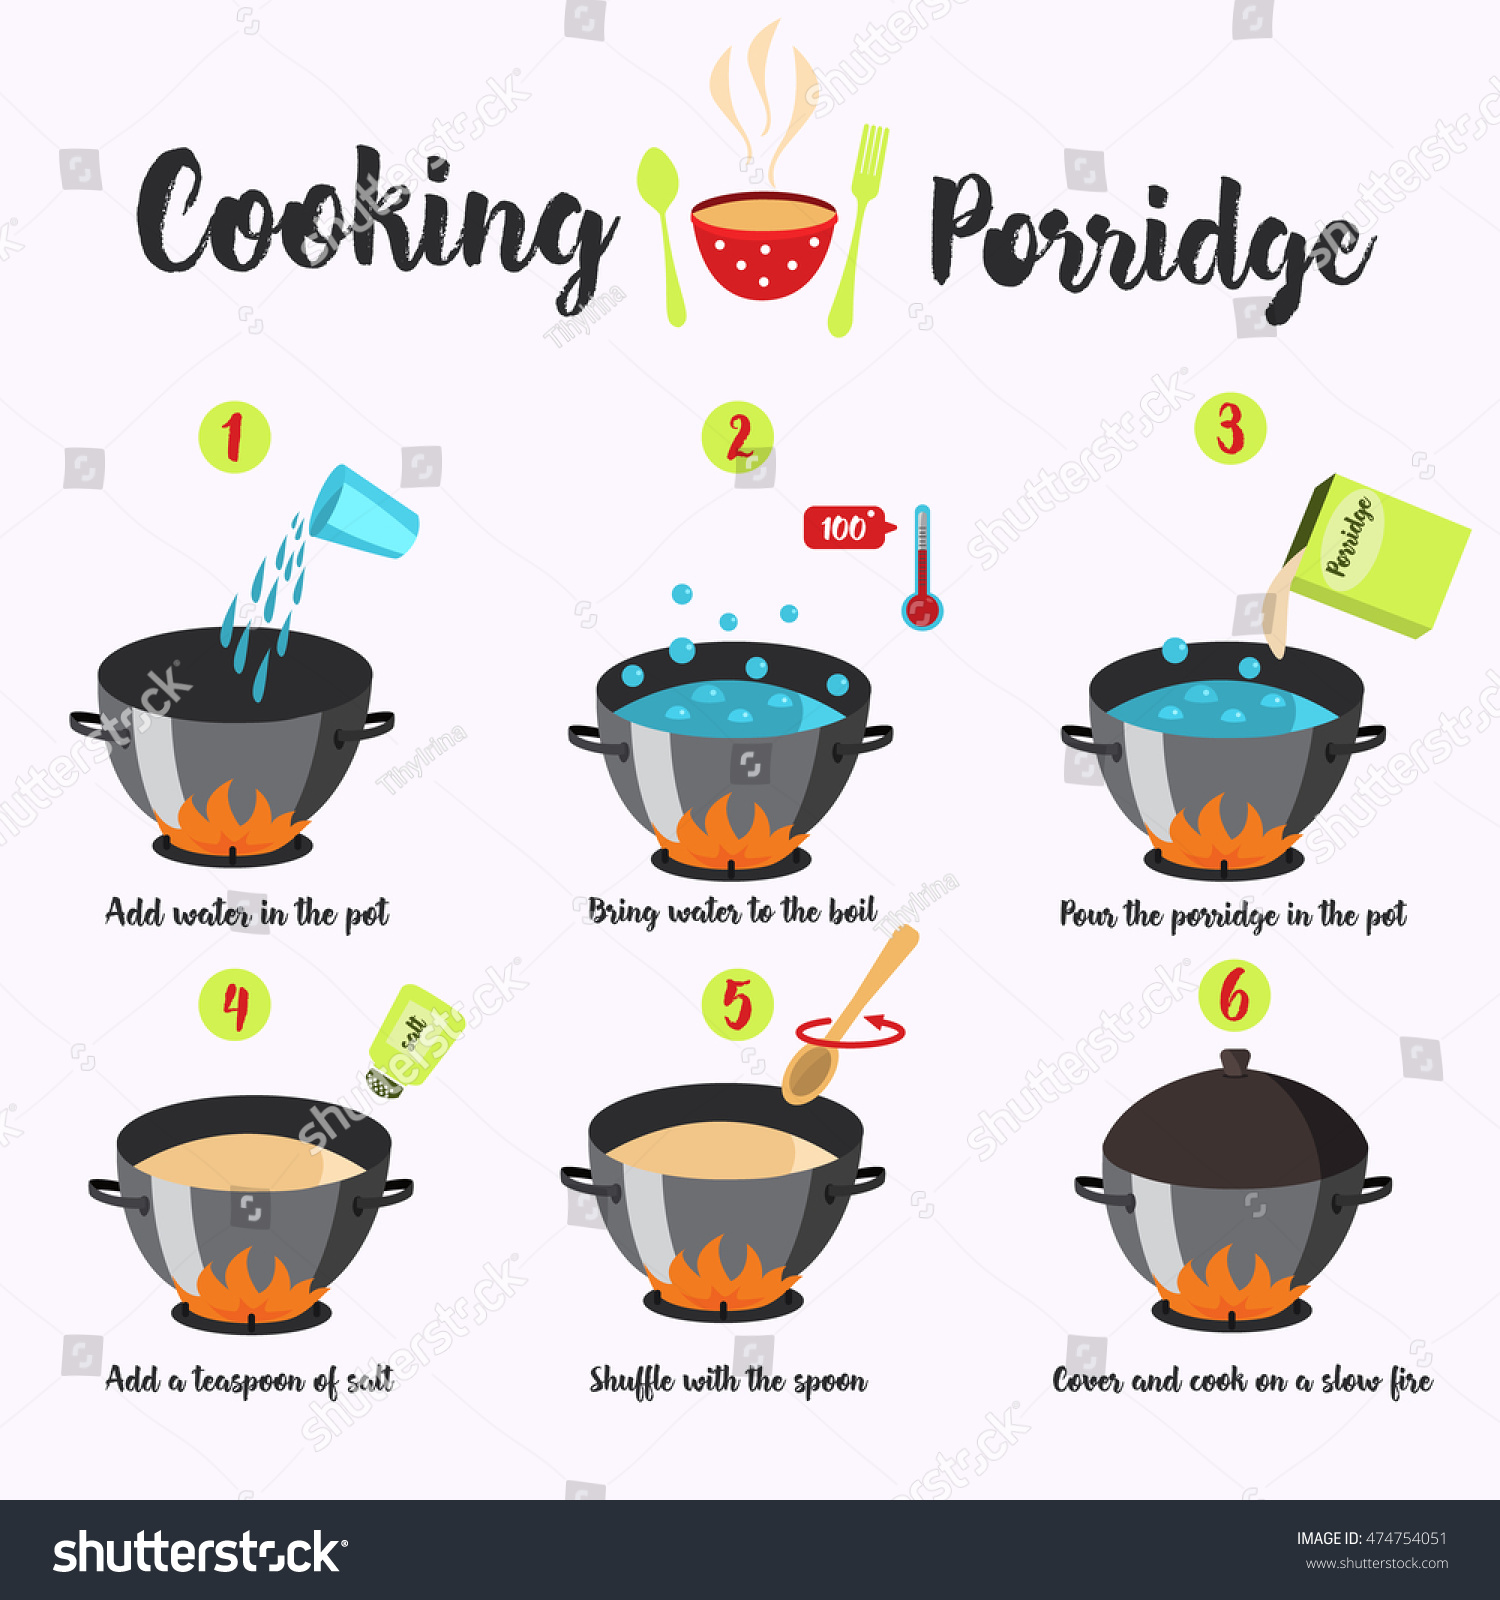 Cooking Instructions Manual Cooking Porridge Vector Stock Vector